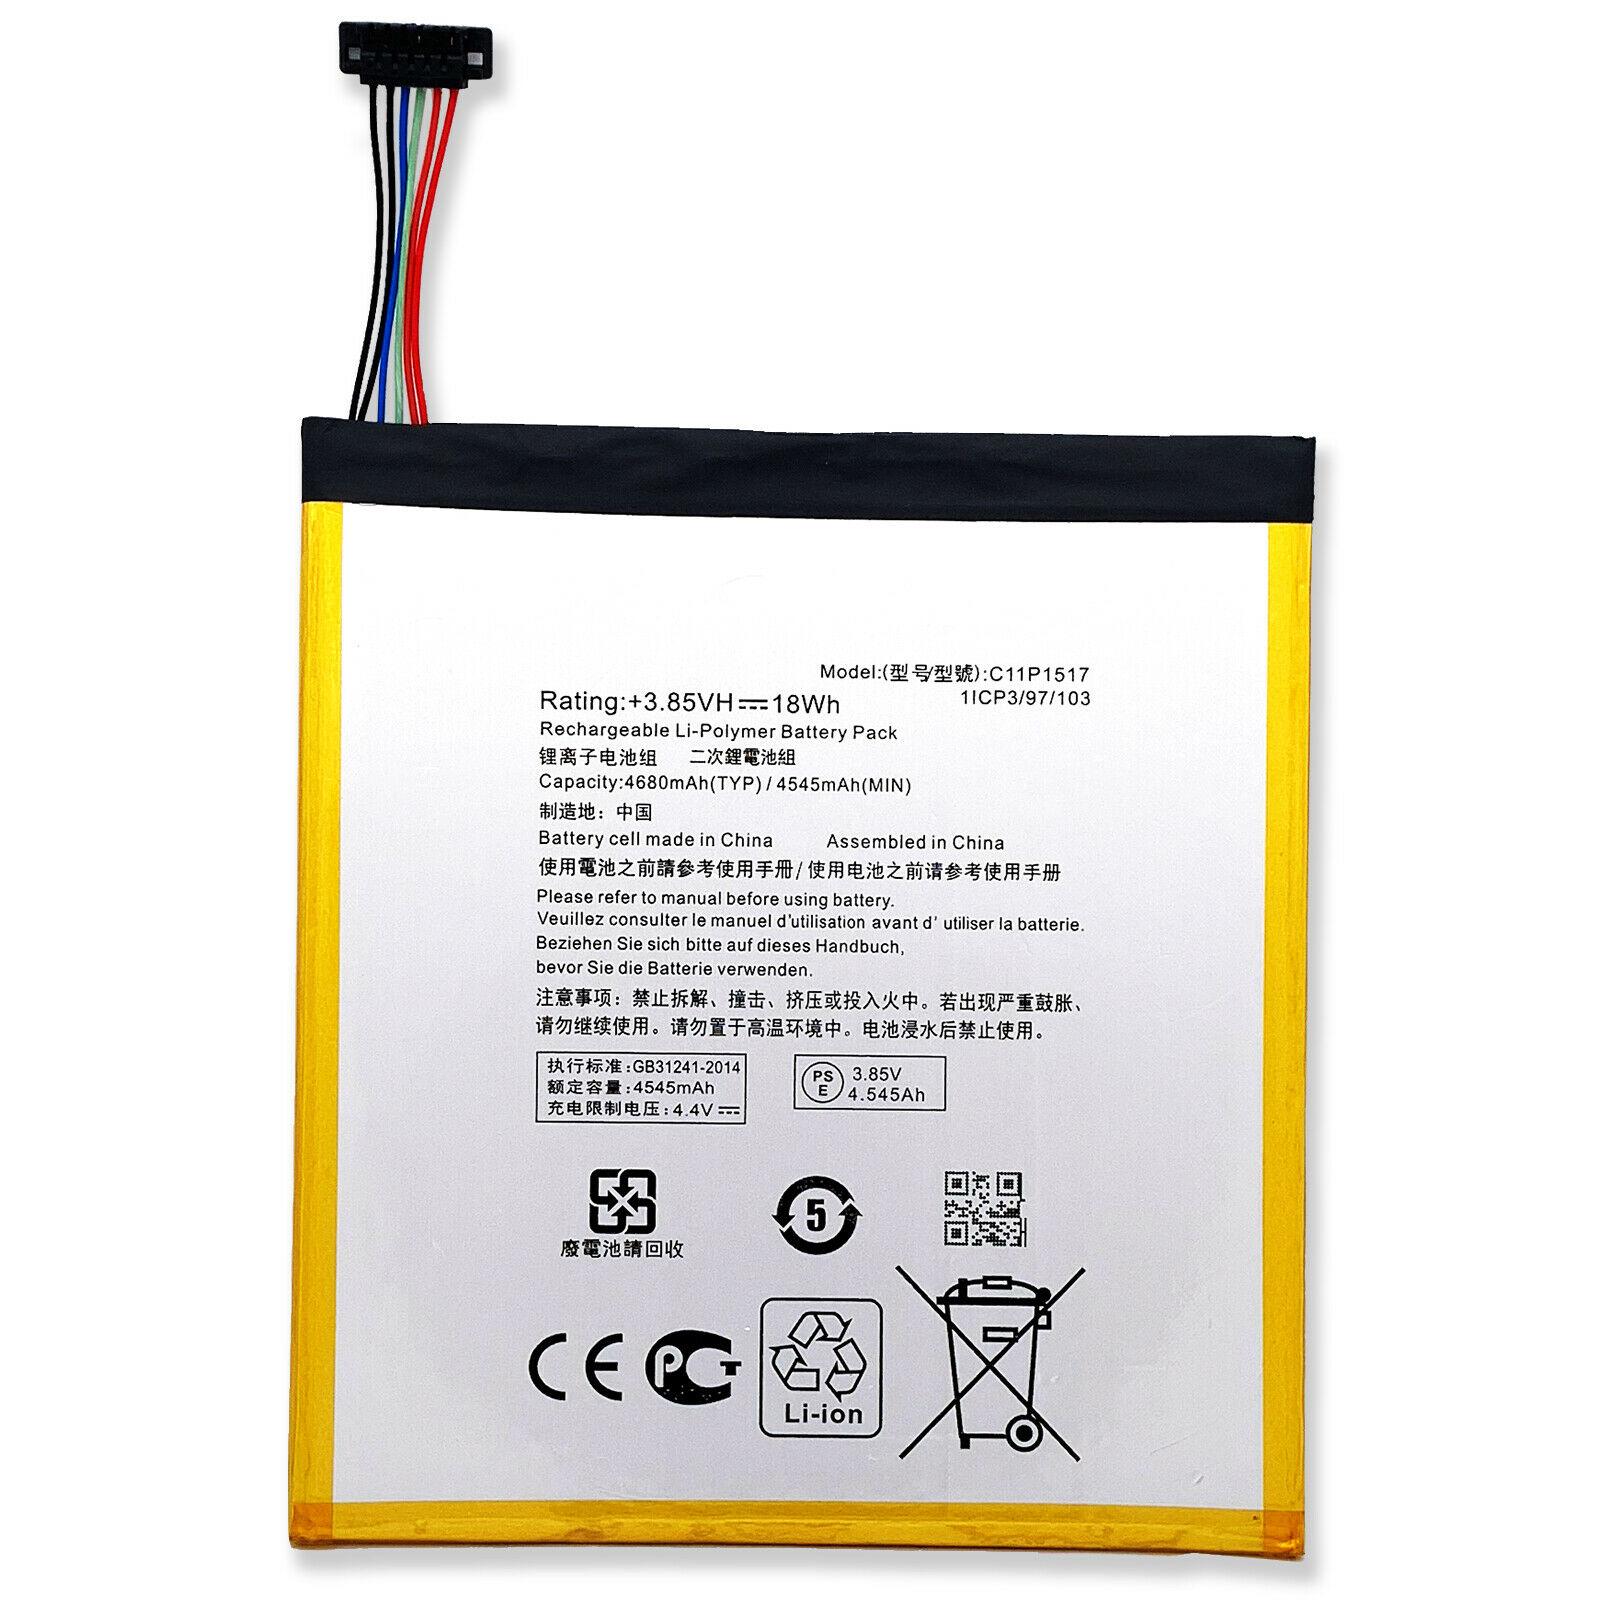 Accu Asus ZenPad C 7.0 P01Z ZenPad 10 Z300CNL Z300M 0B200-01580200 C11P1517(compatible)